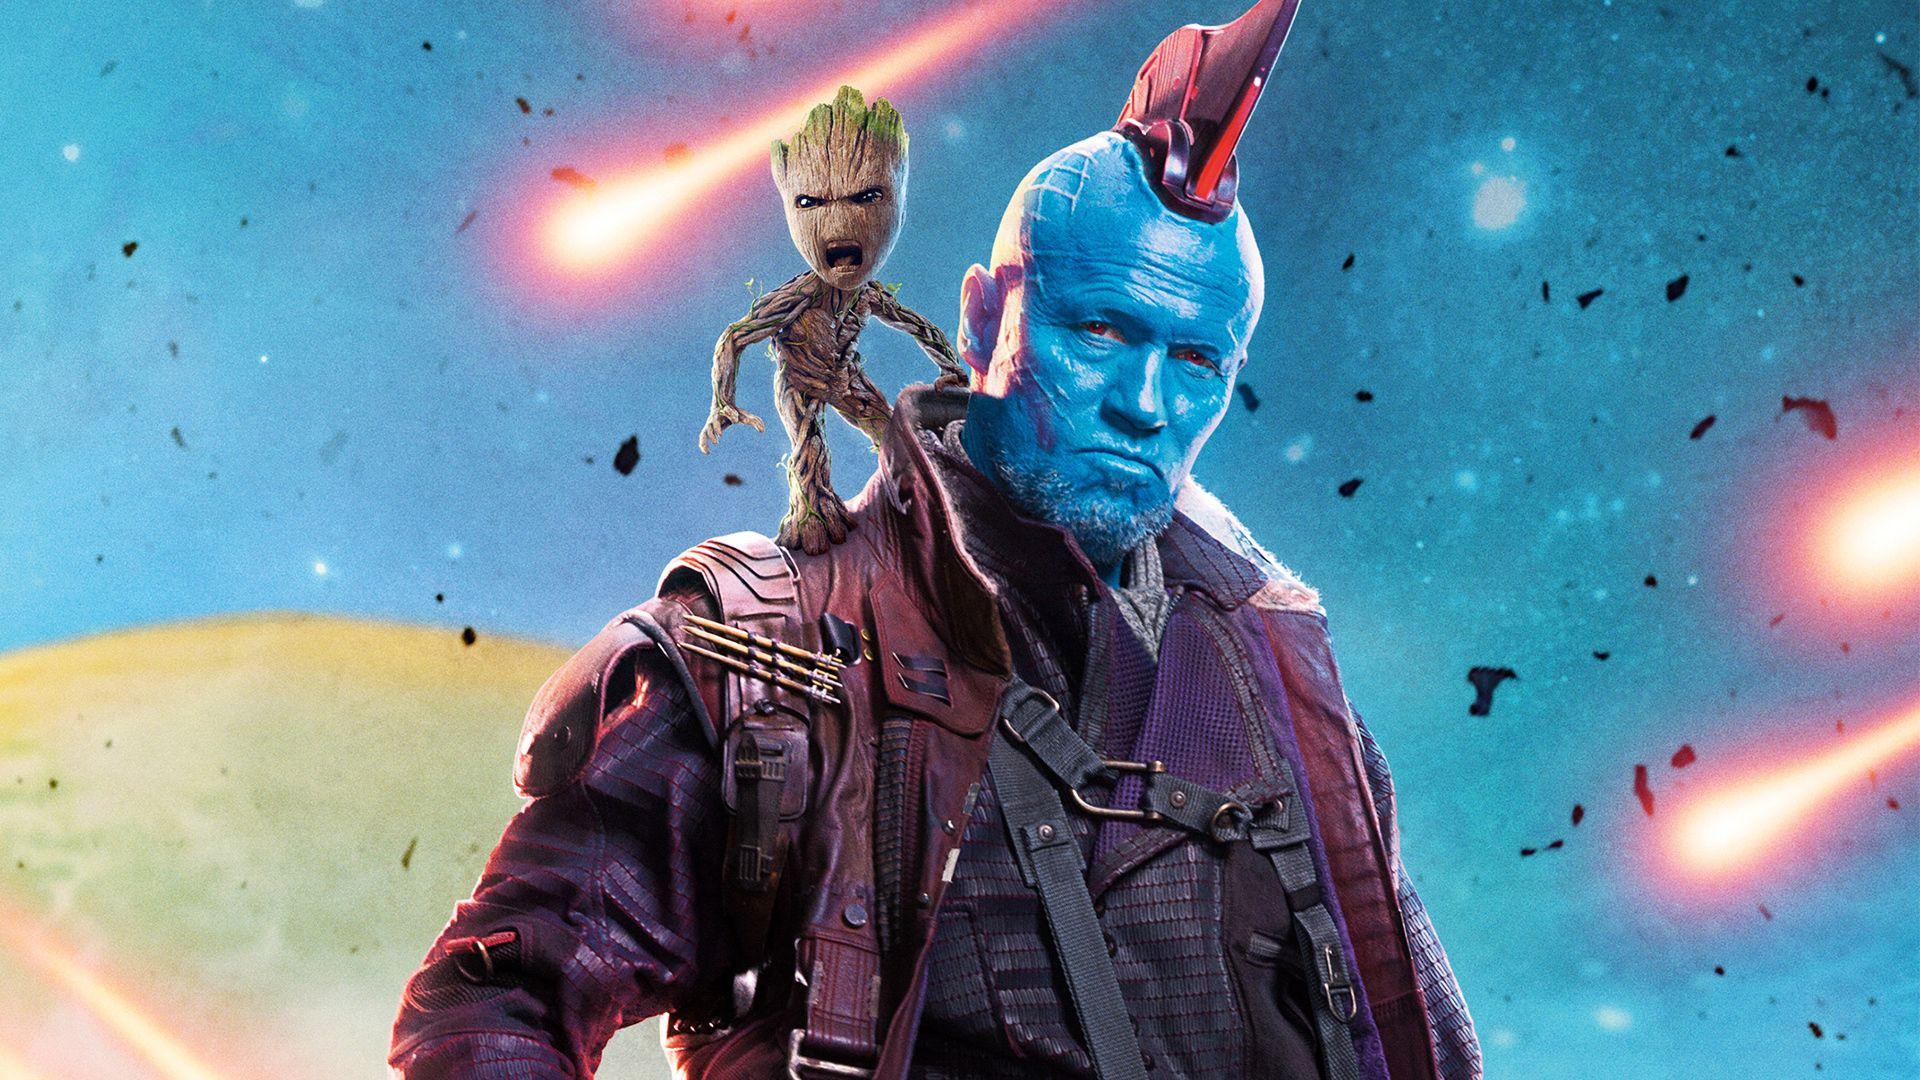 Link a guardiani-della-galassia-yondu-ravagers-david-bowie-gli-errori-v6-301051